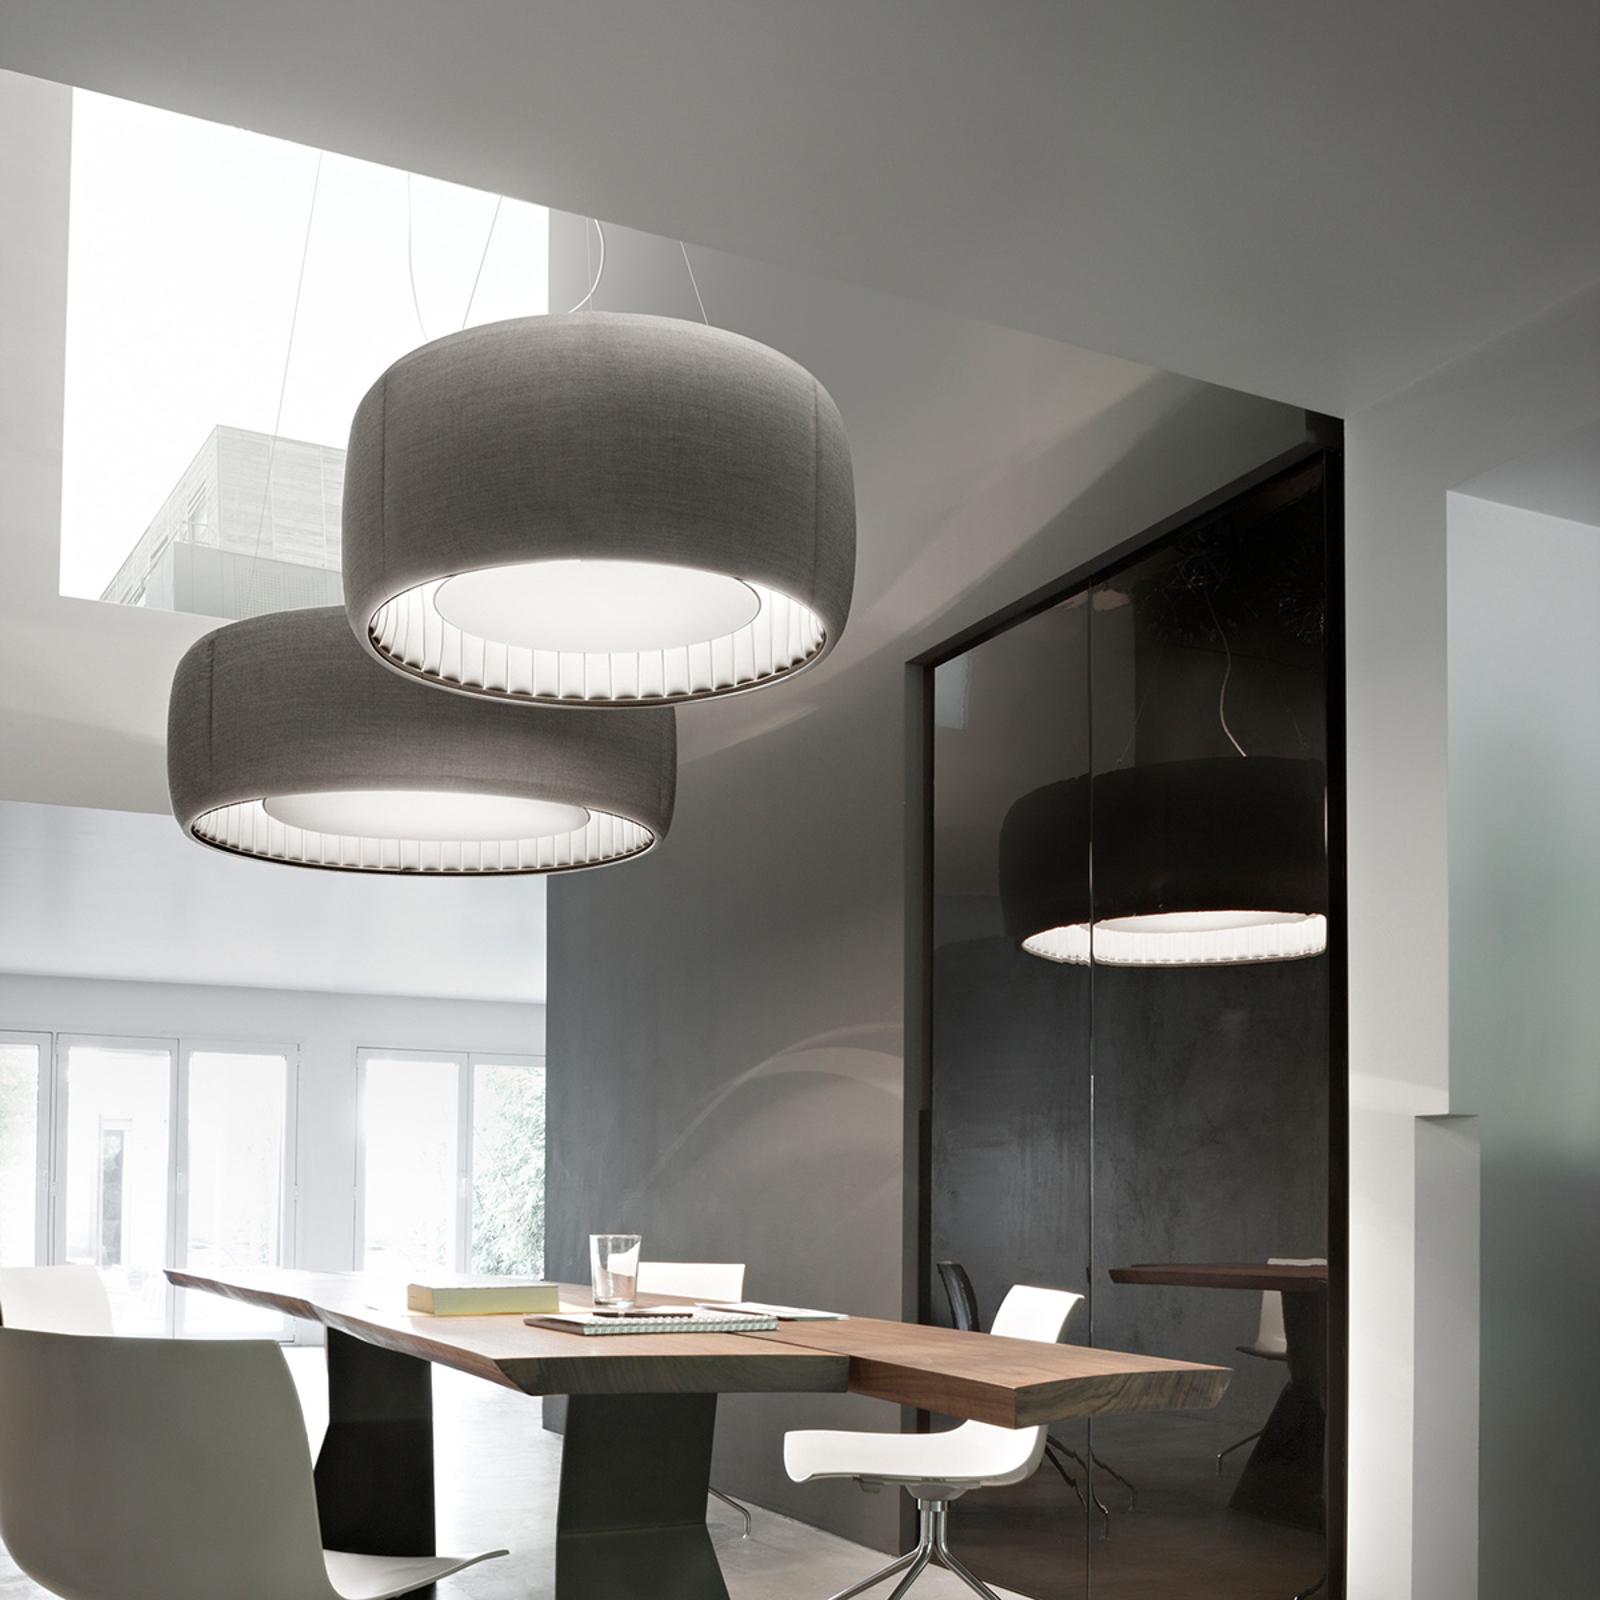 Luceplan Silenzio LED hanglamp grijs Ø 120cm